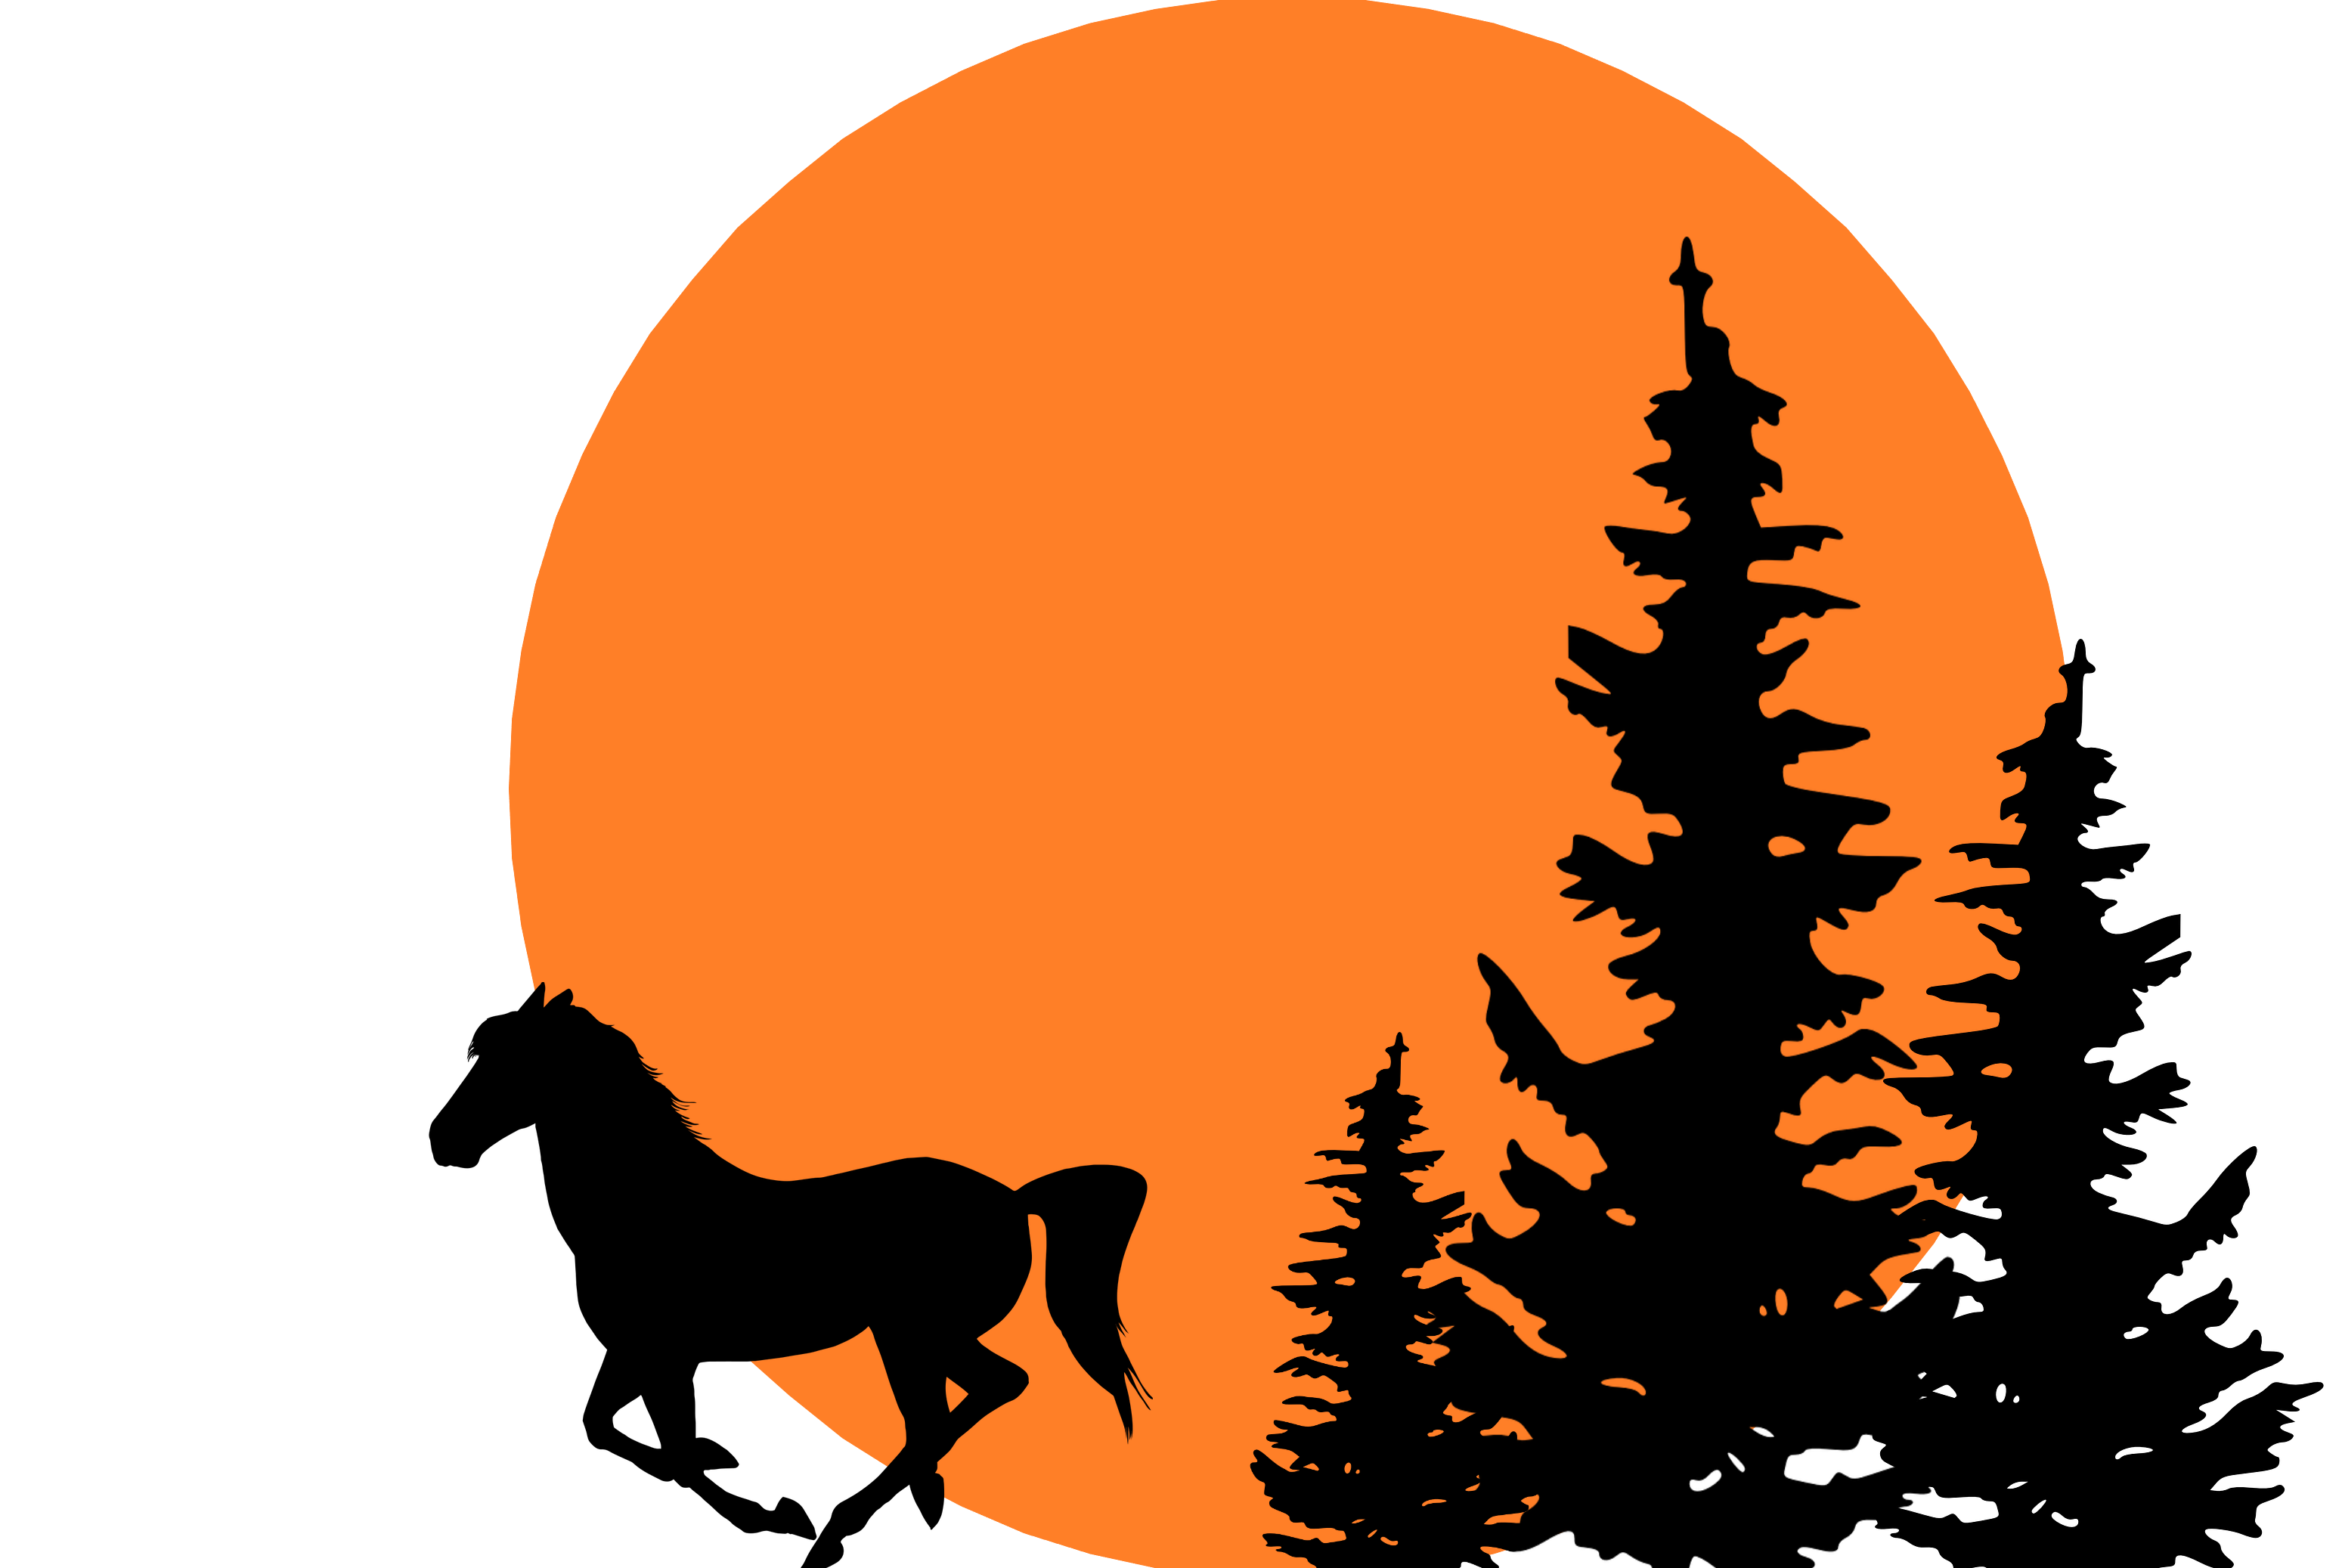 Running horse, sunset, pine trees